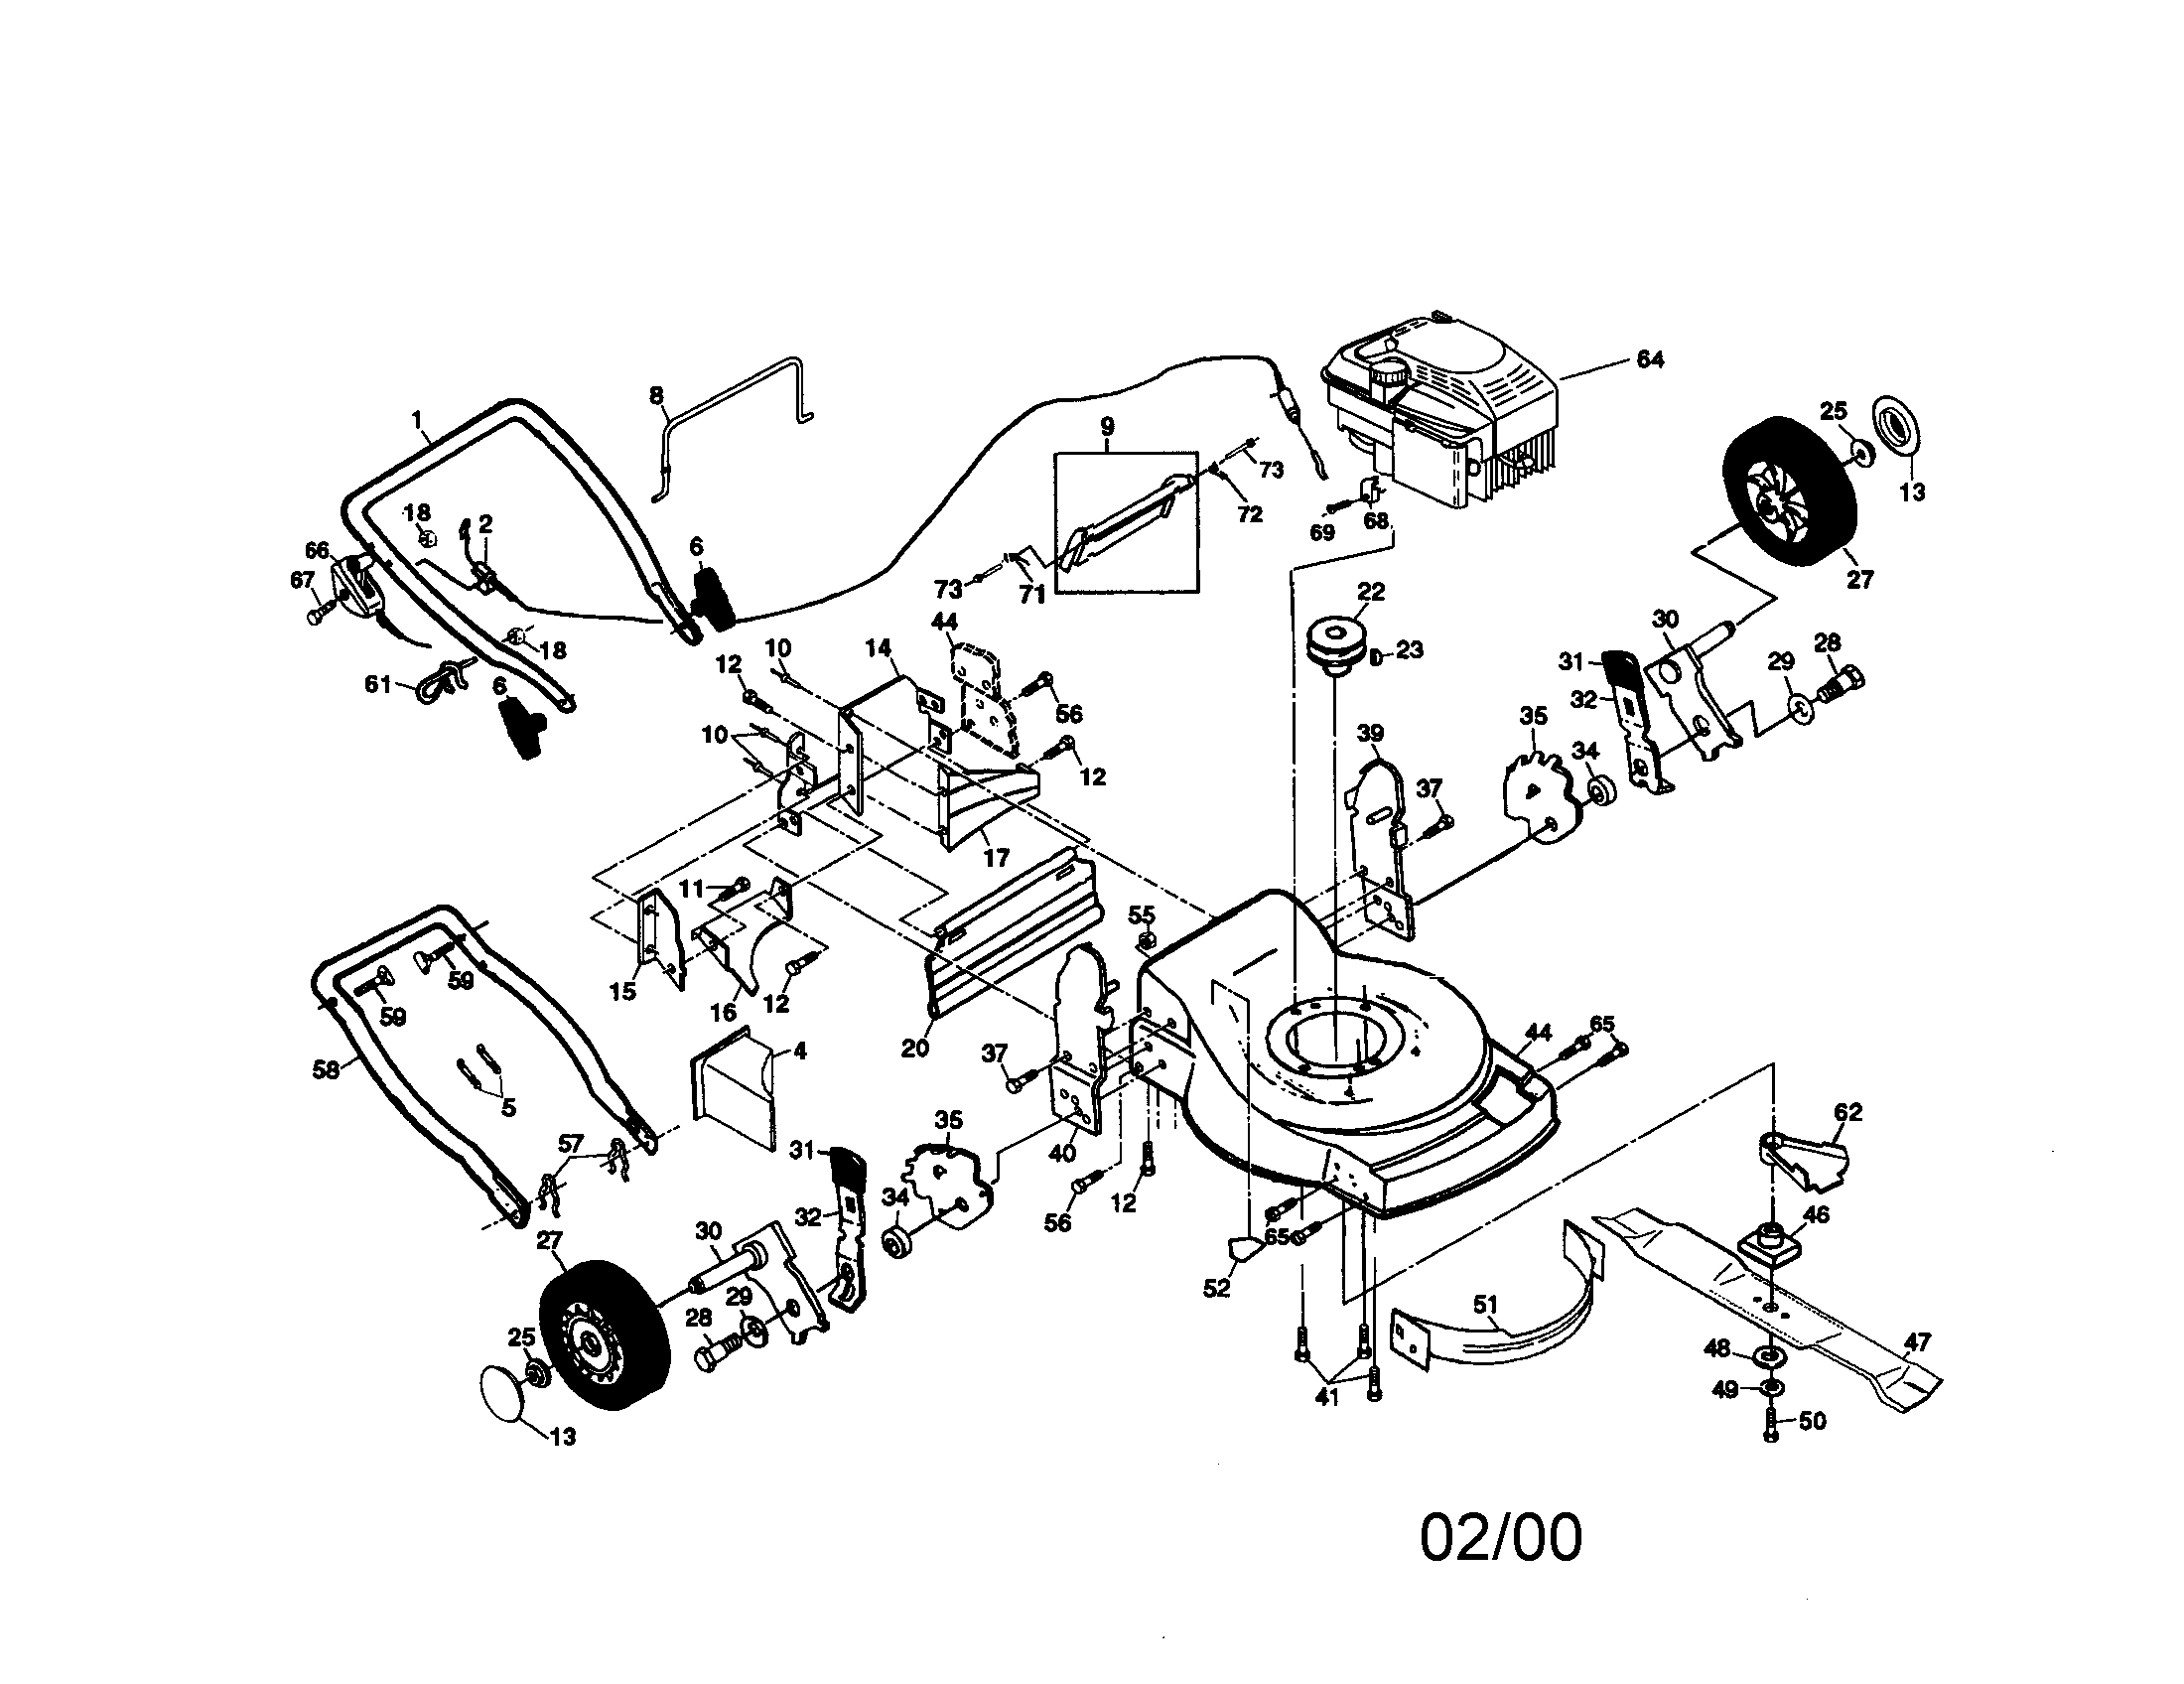 Sears Craftsman Lawn Tractor Parts Manual